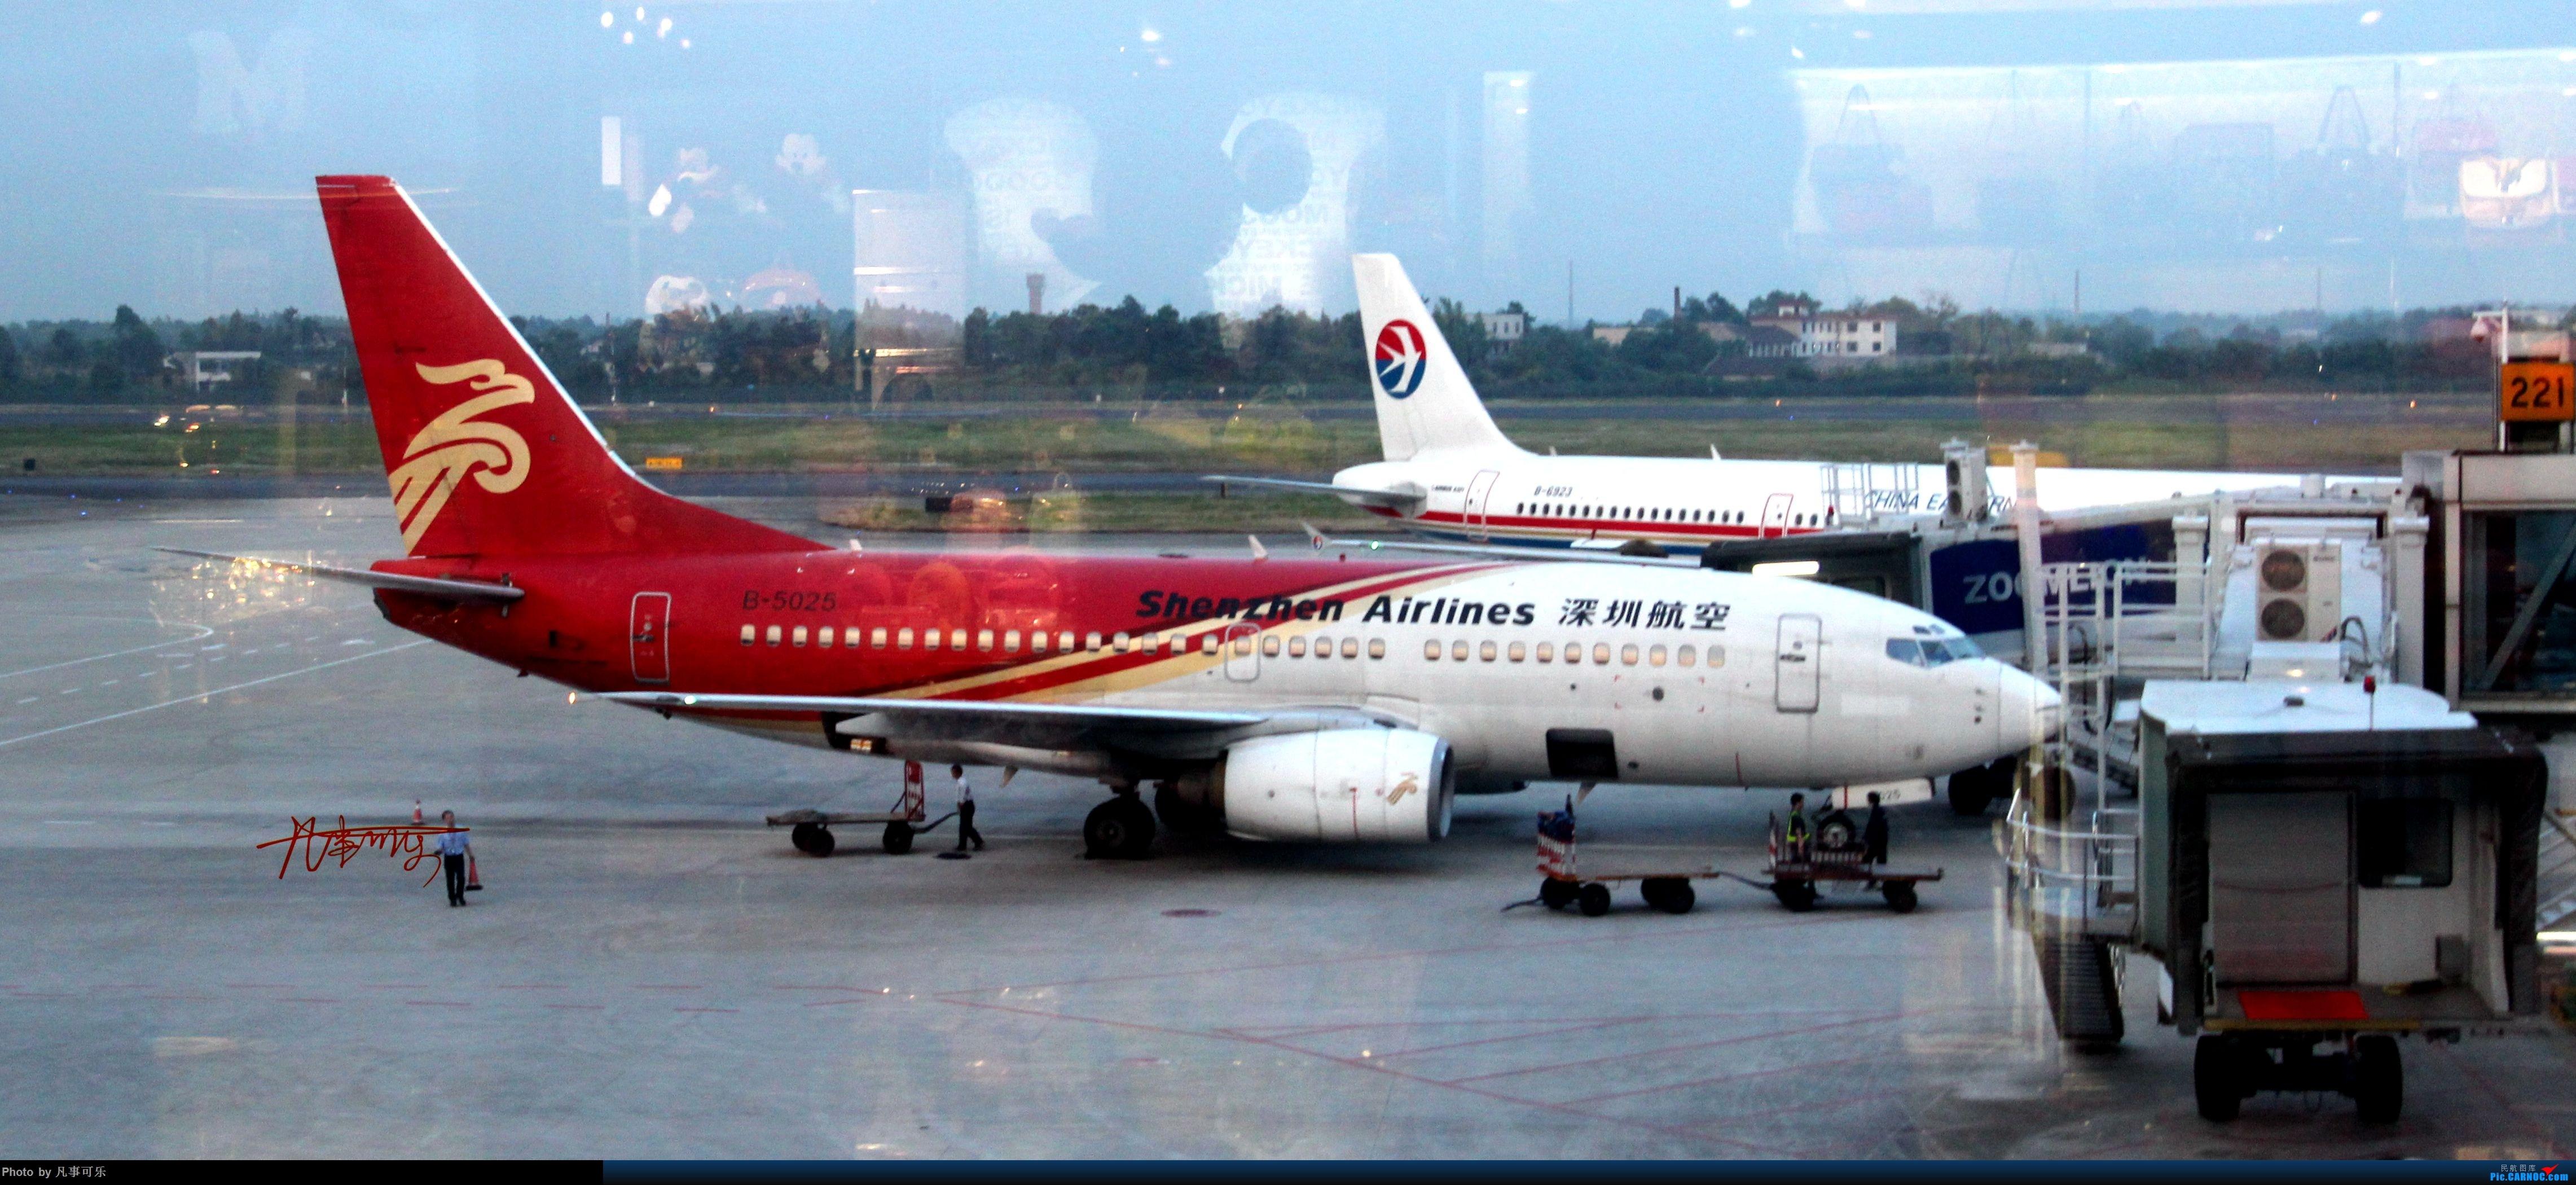 Re:[原创]这几年国内外拍的一些机 BOEING 737-700 B-5025 长沙黄花机场